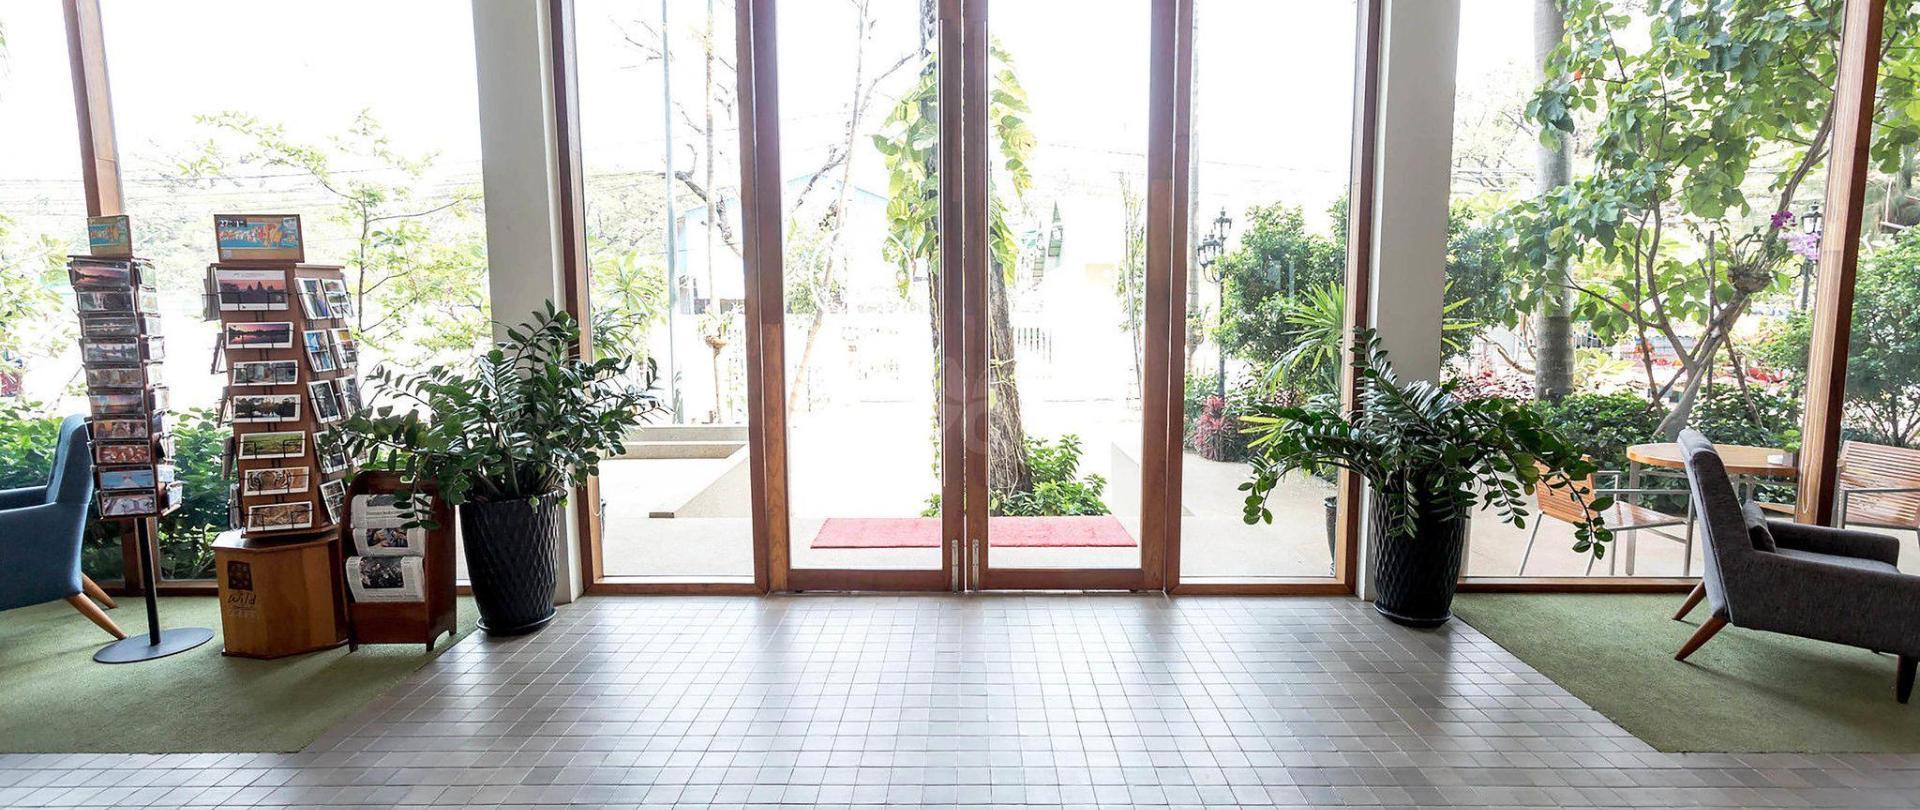 entrance-v16271683-2000.jpg